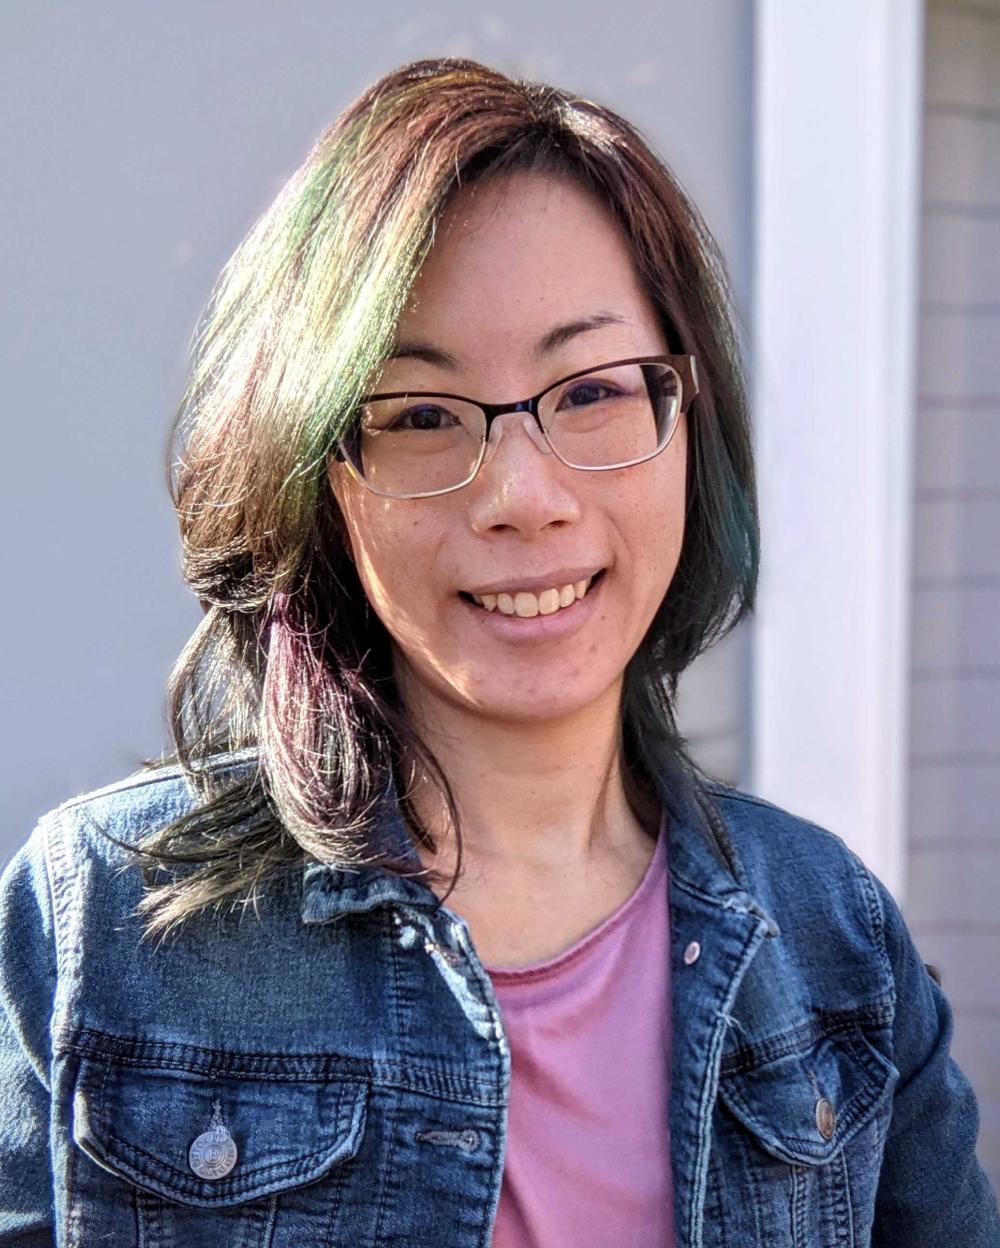 Headshot of Amy Chantasirivisal